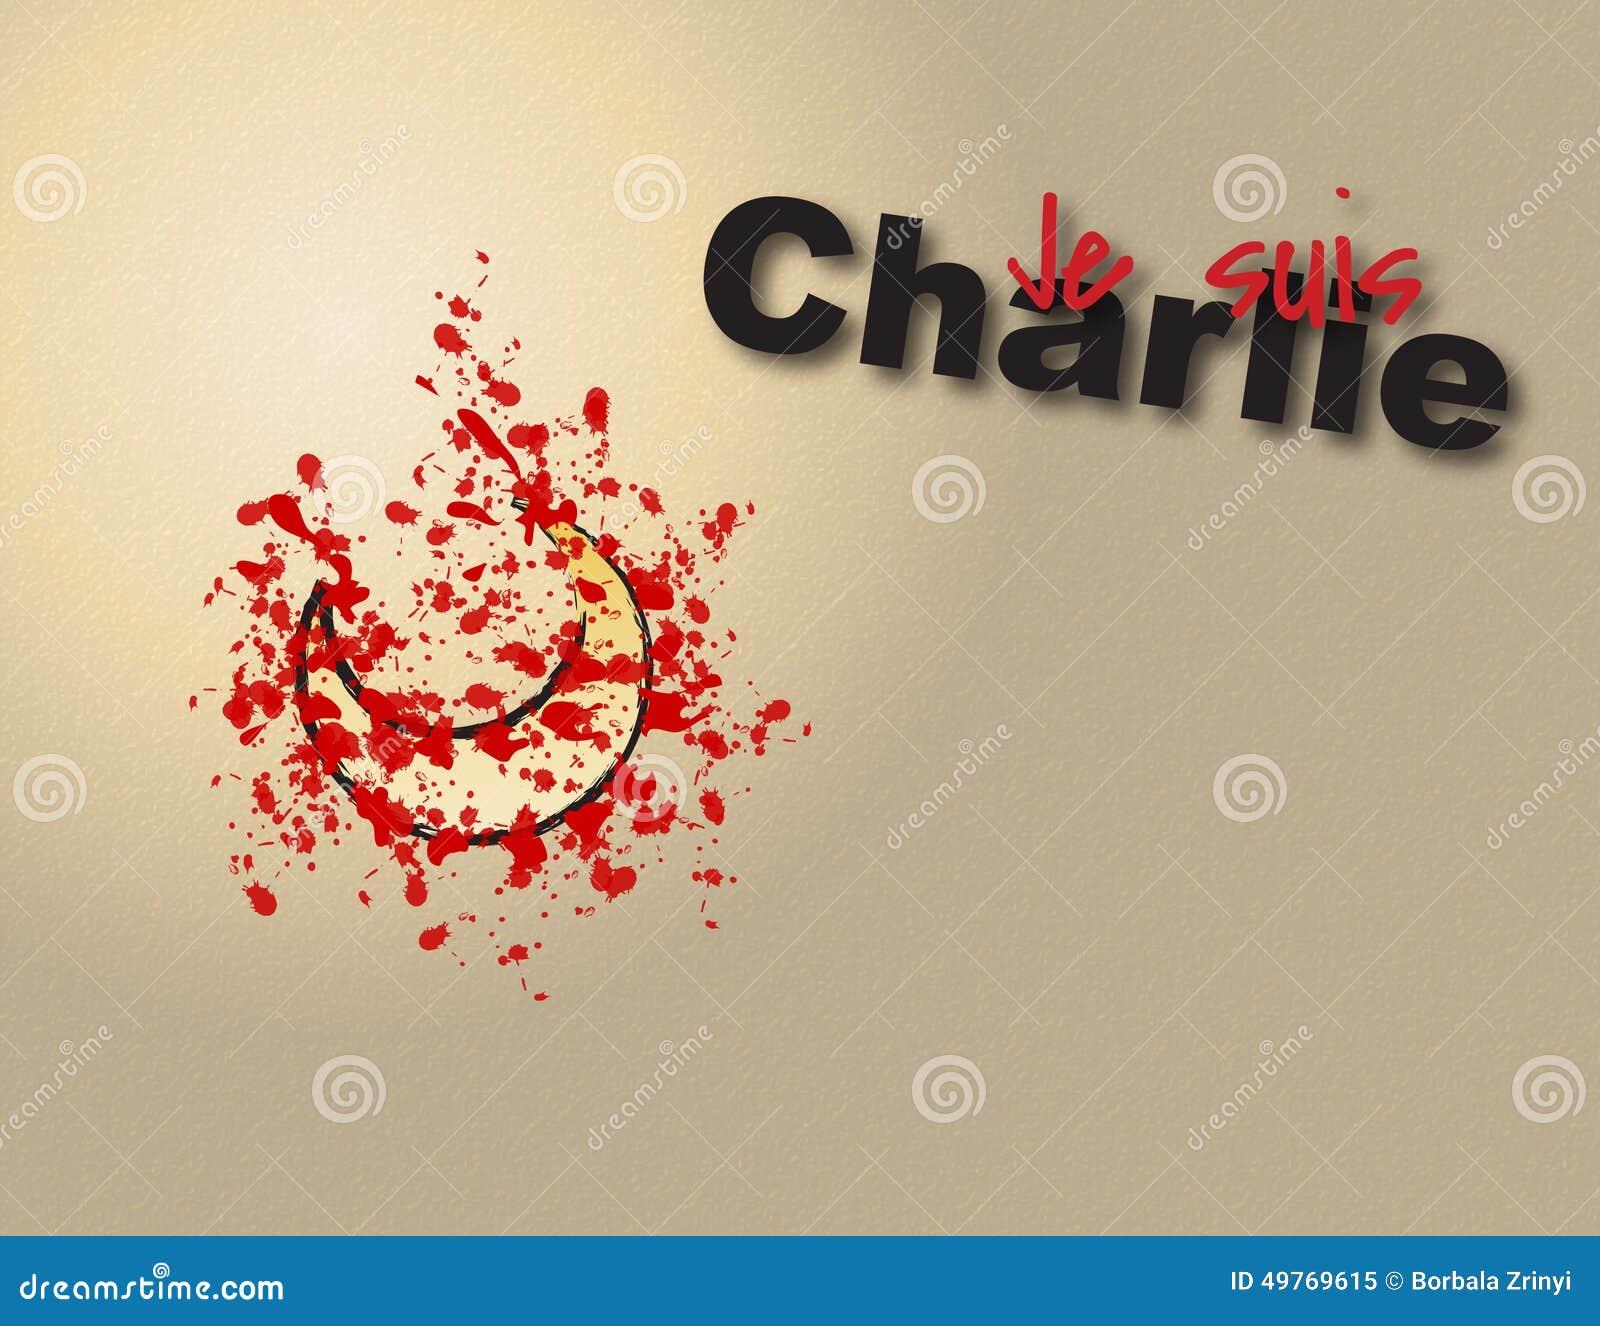 Je Suis Charlie  Vector Graphic Illustration For Je Suis